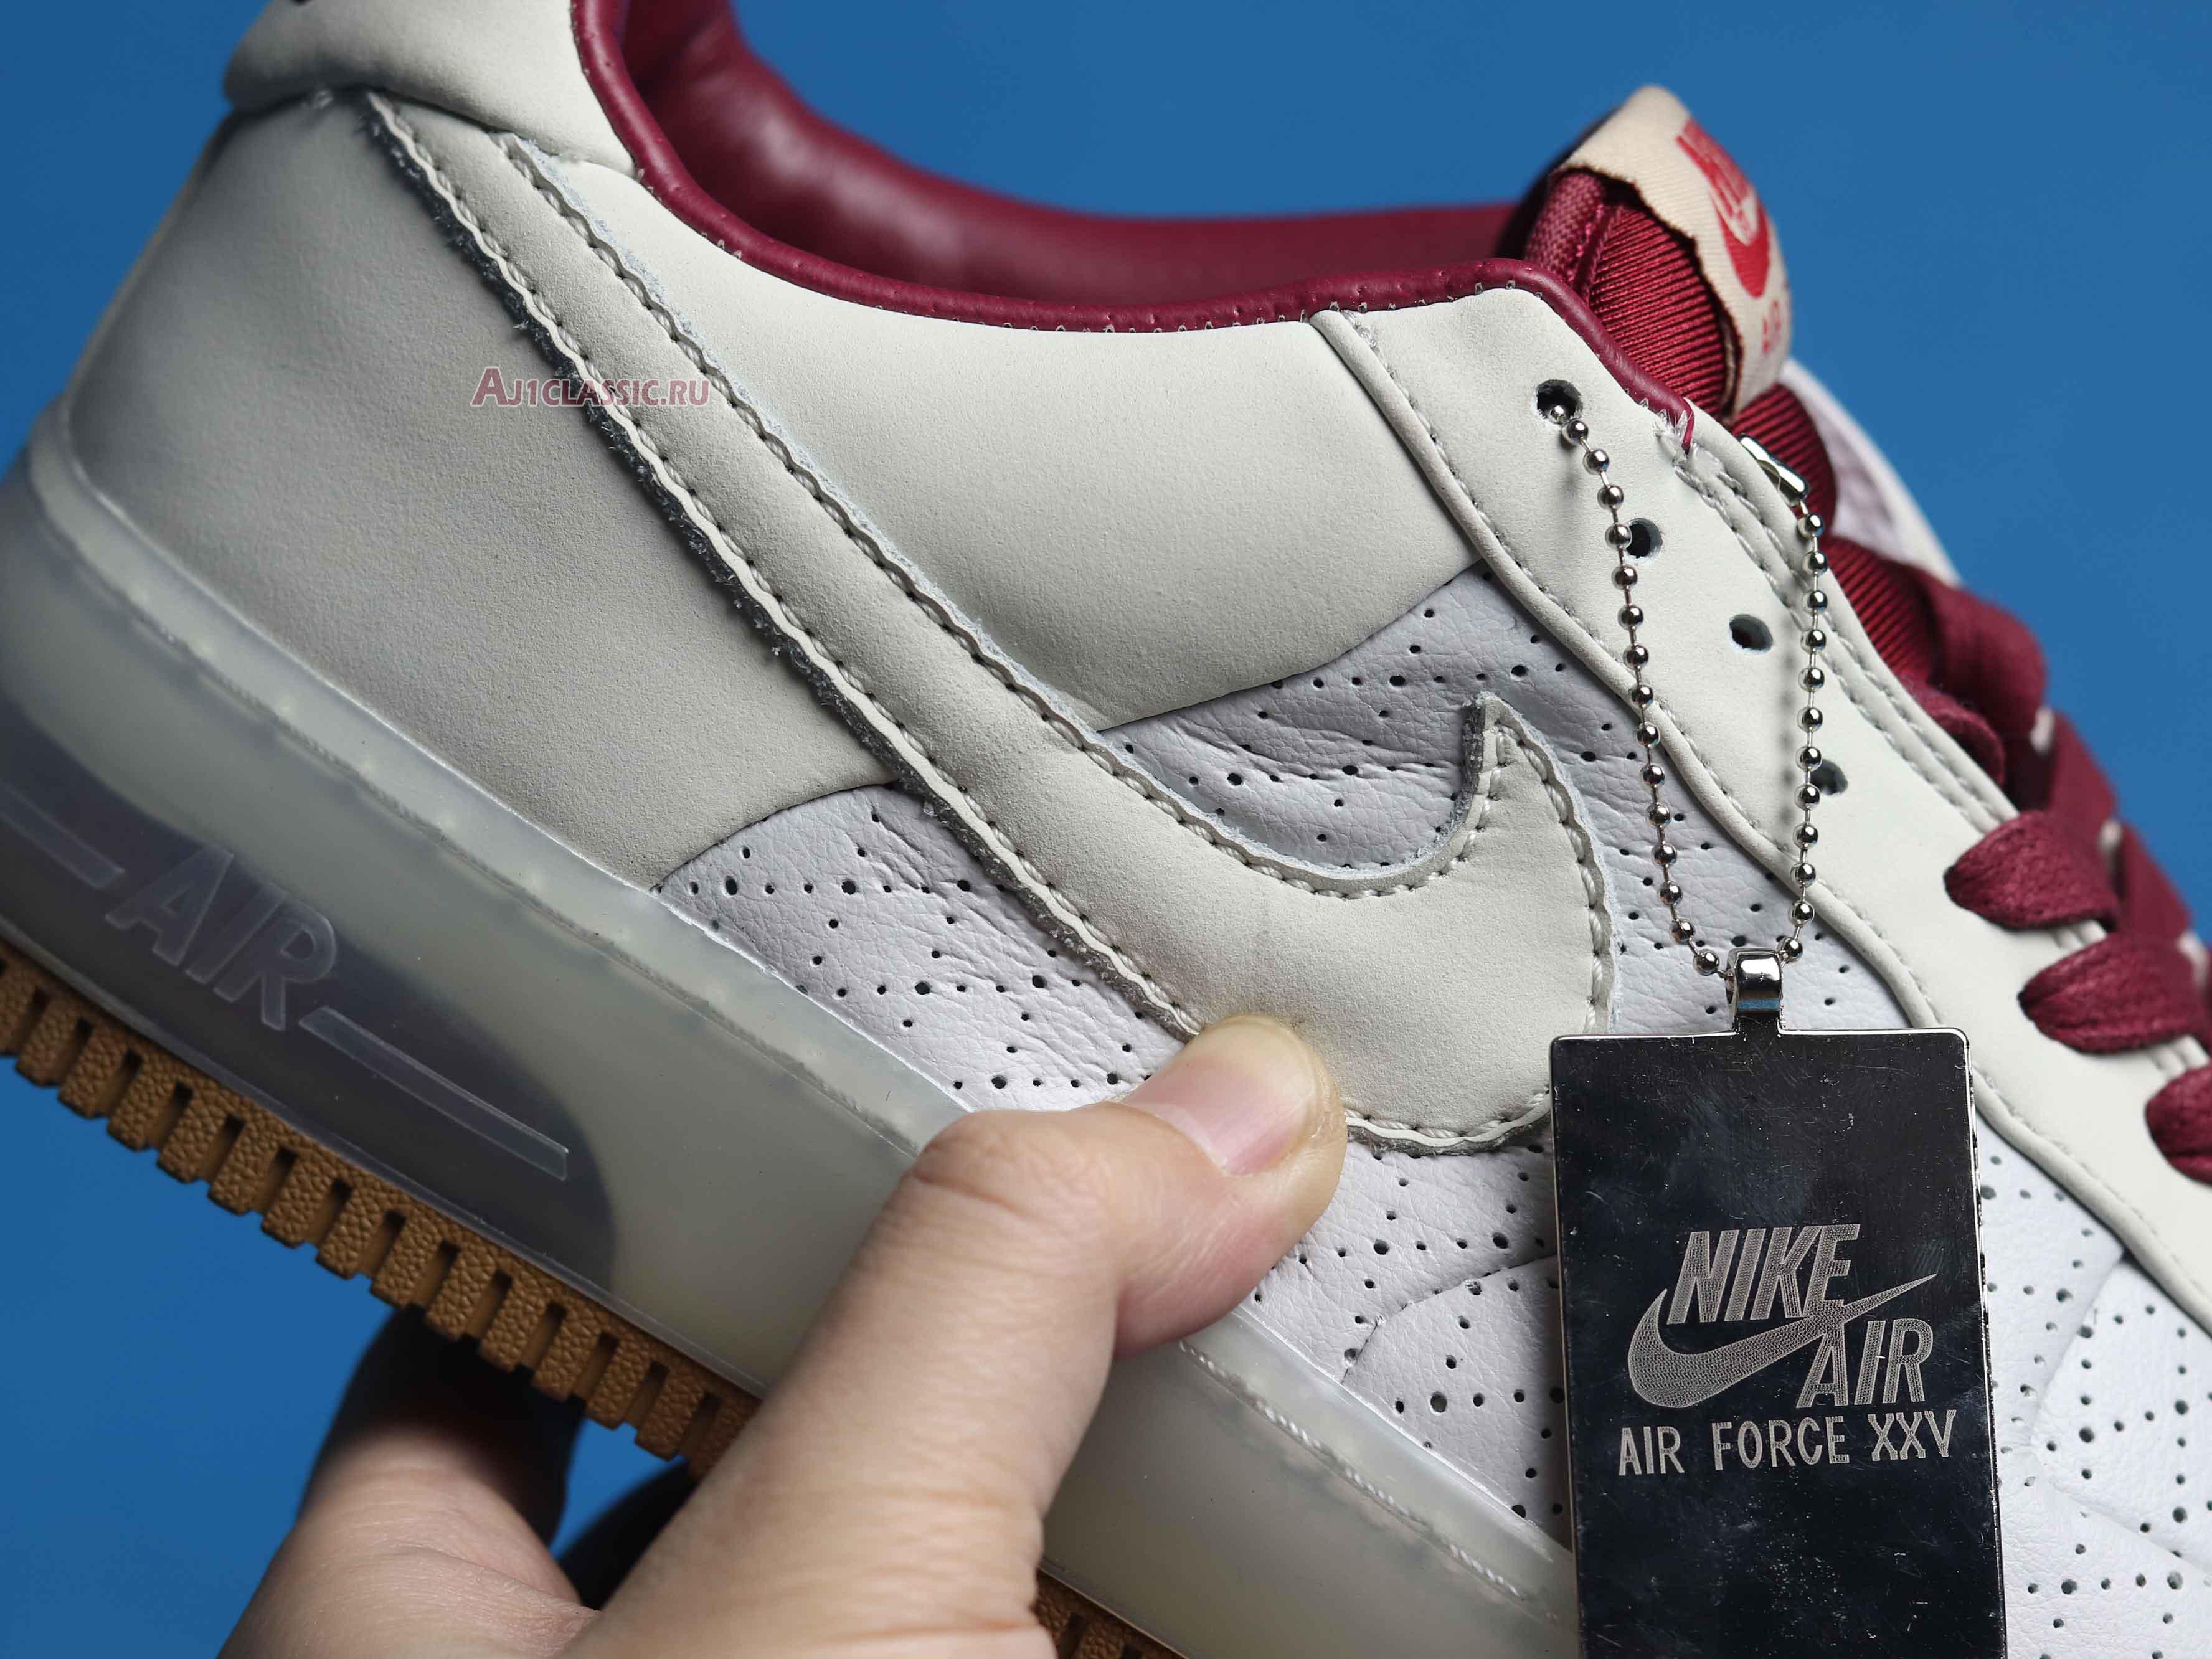 Nike Air Force 1 Supreme Max Air 318772-003